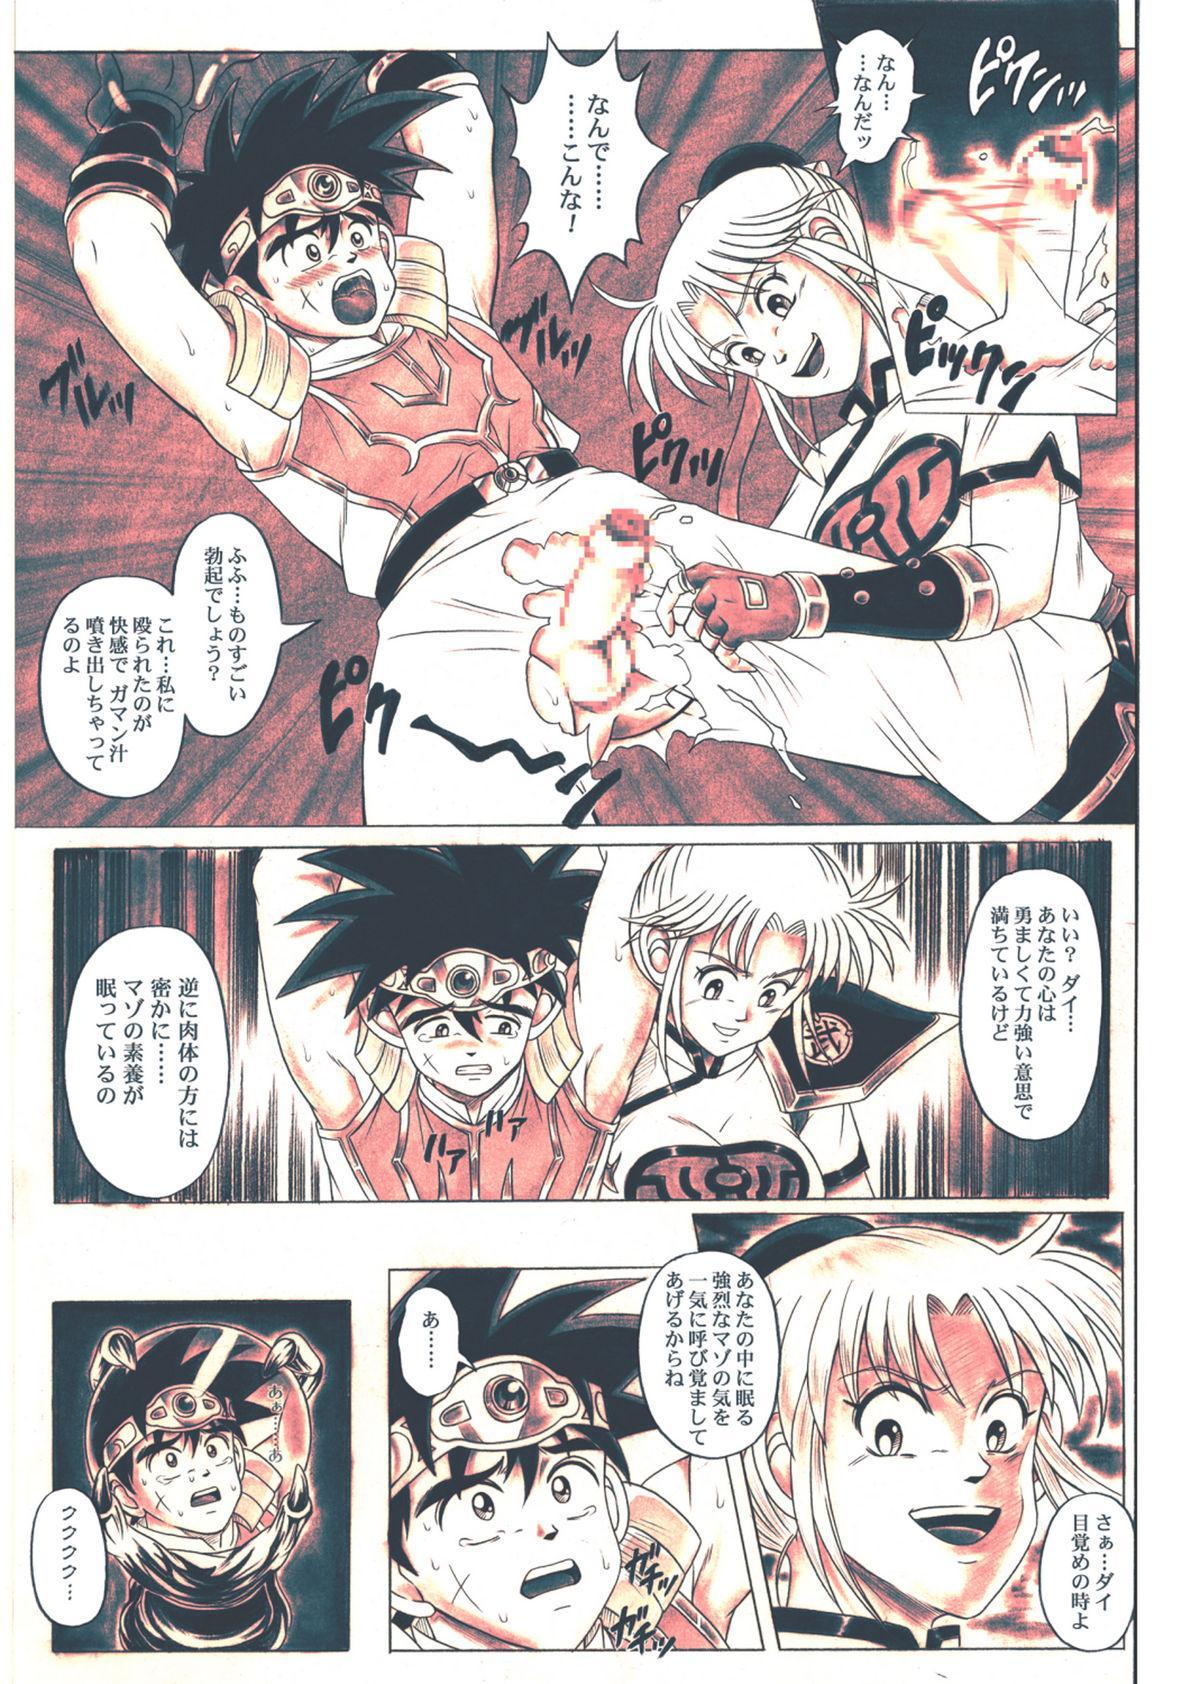 [Cyclone (Reizei, Izumi)] STAR TAC IDO ~Youkuso Haja no Doukutsu he~ Chuuhen Download edition (Dragon Warrior: Dai's Great Adventure) [Digital] 122